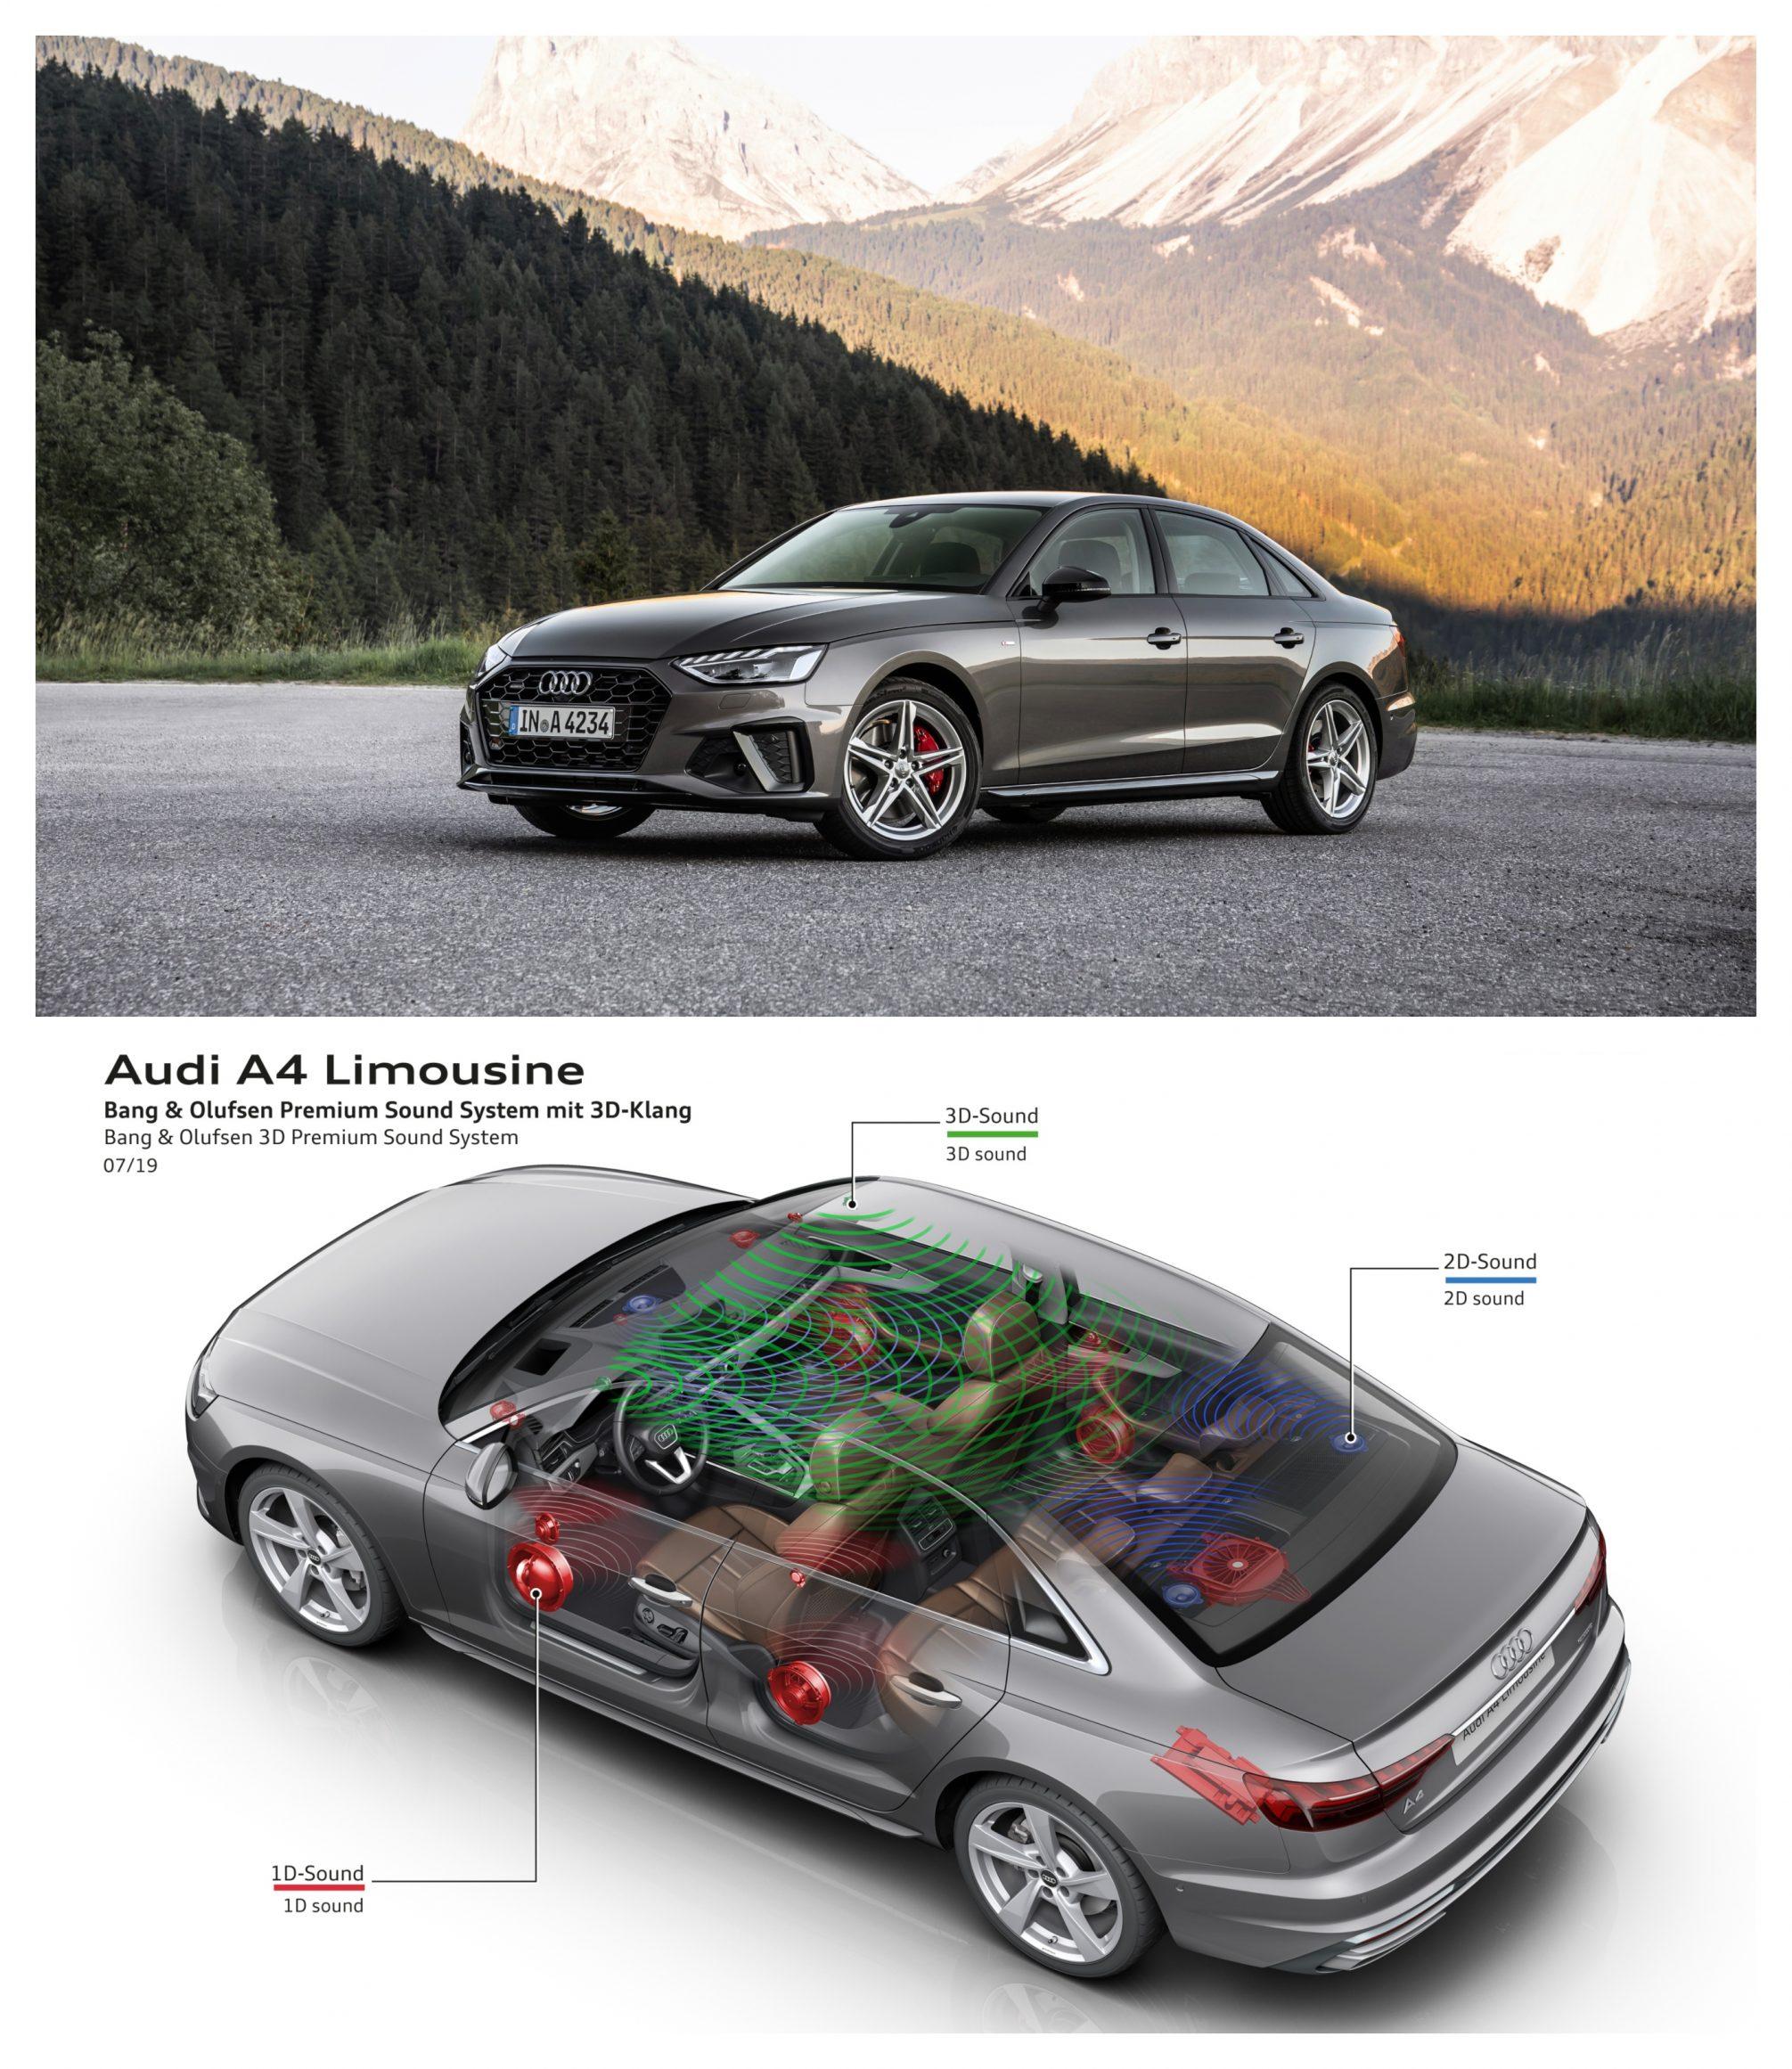 Audi A4 Saloon Bang & Olufsen premium sound system